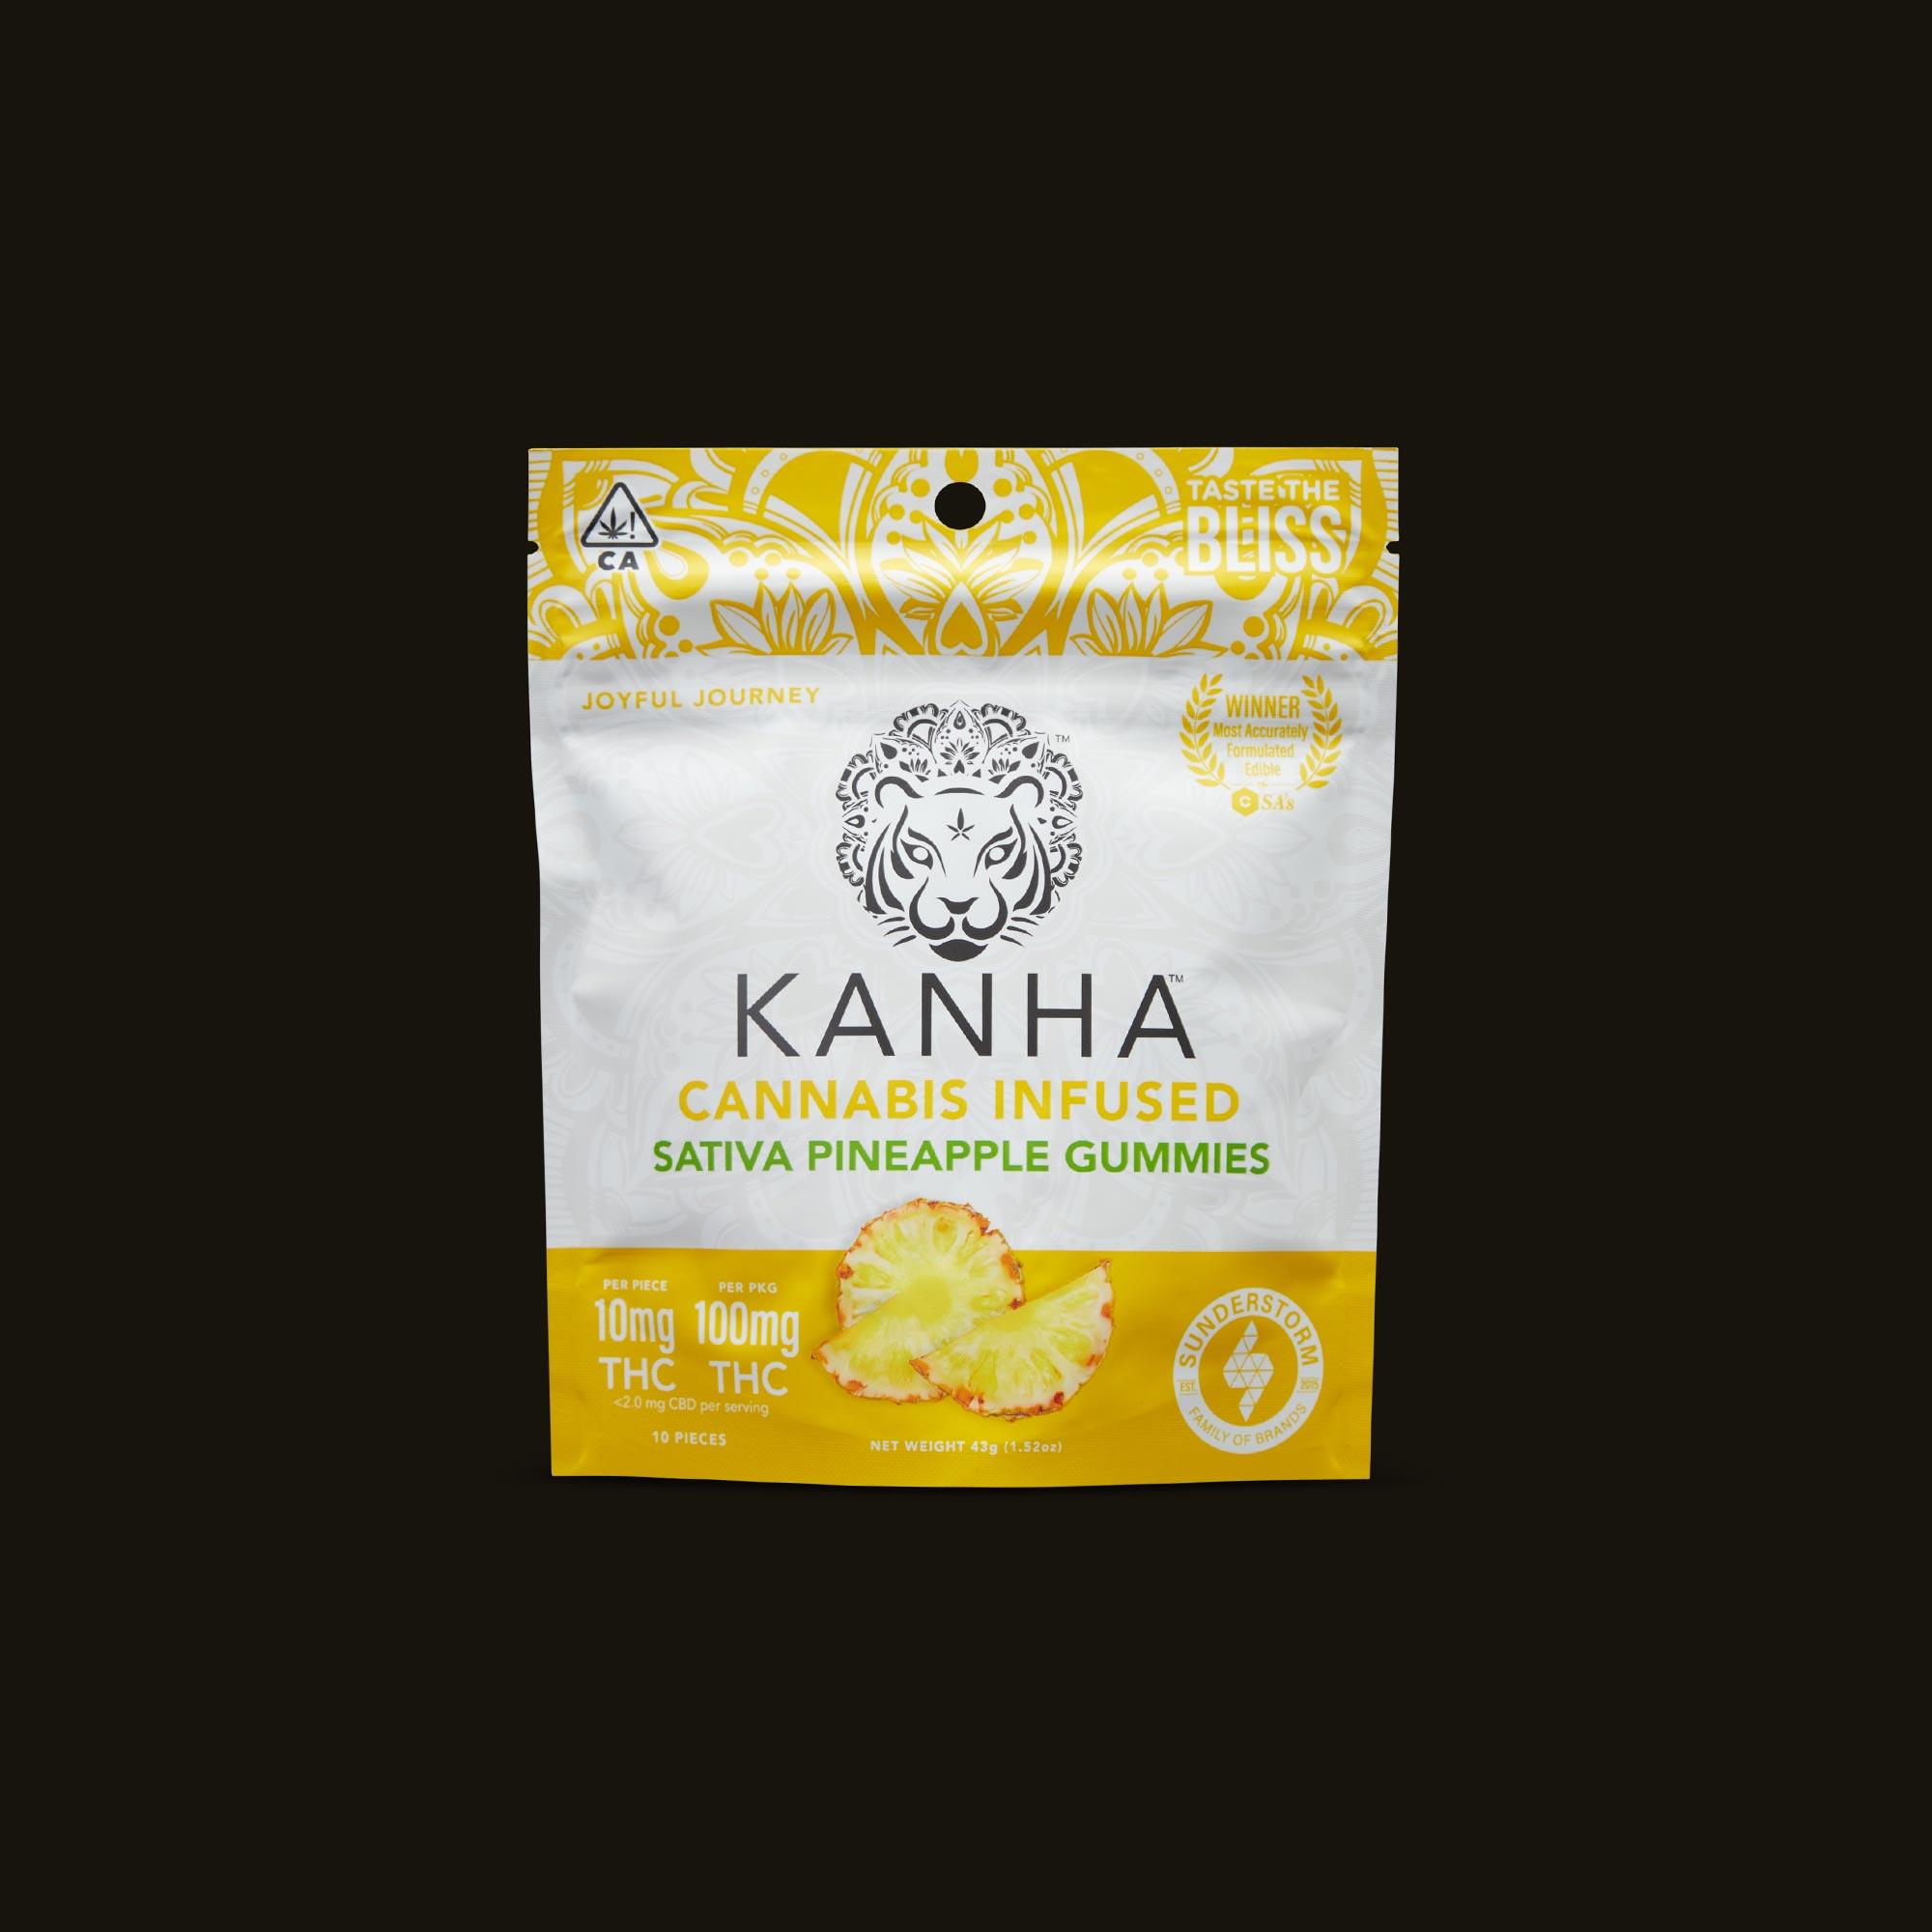 Kanha Pineapple Gummies Front Packaging